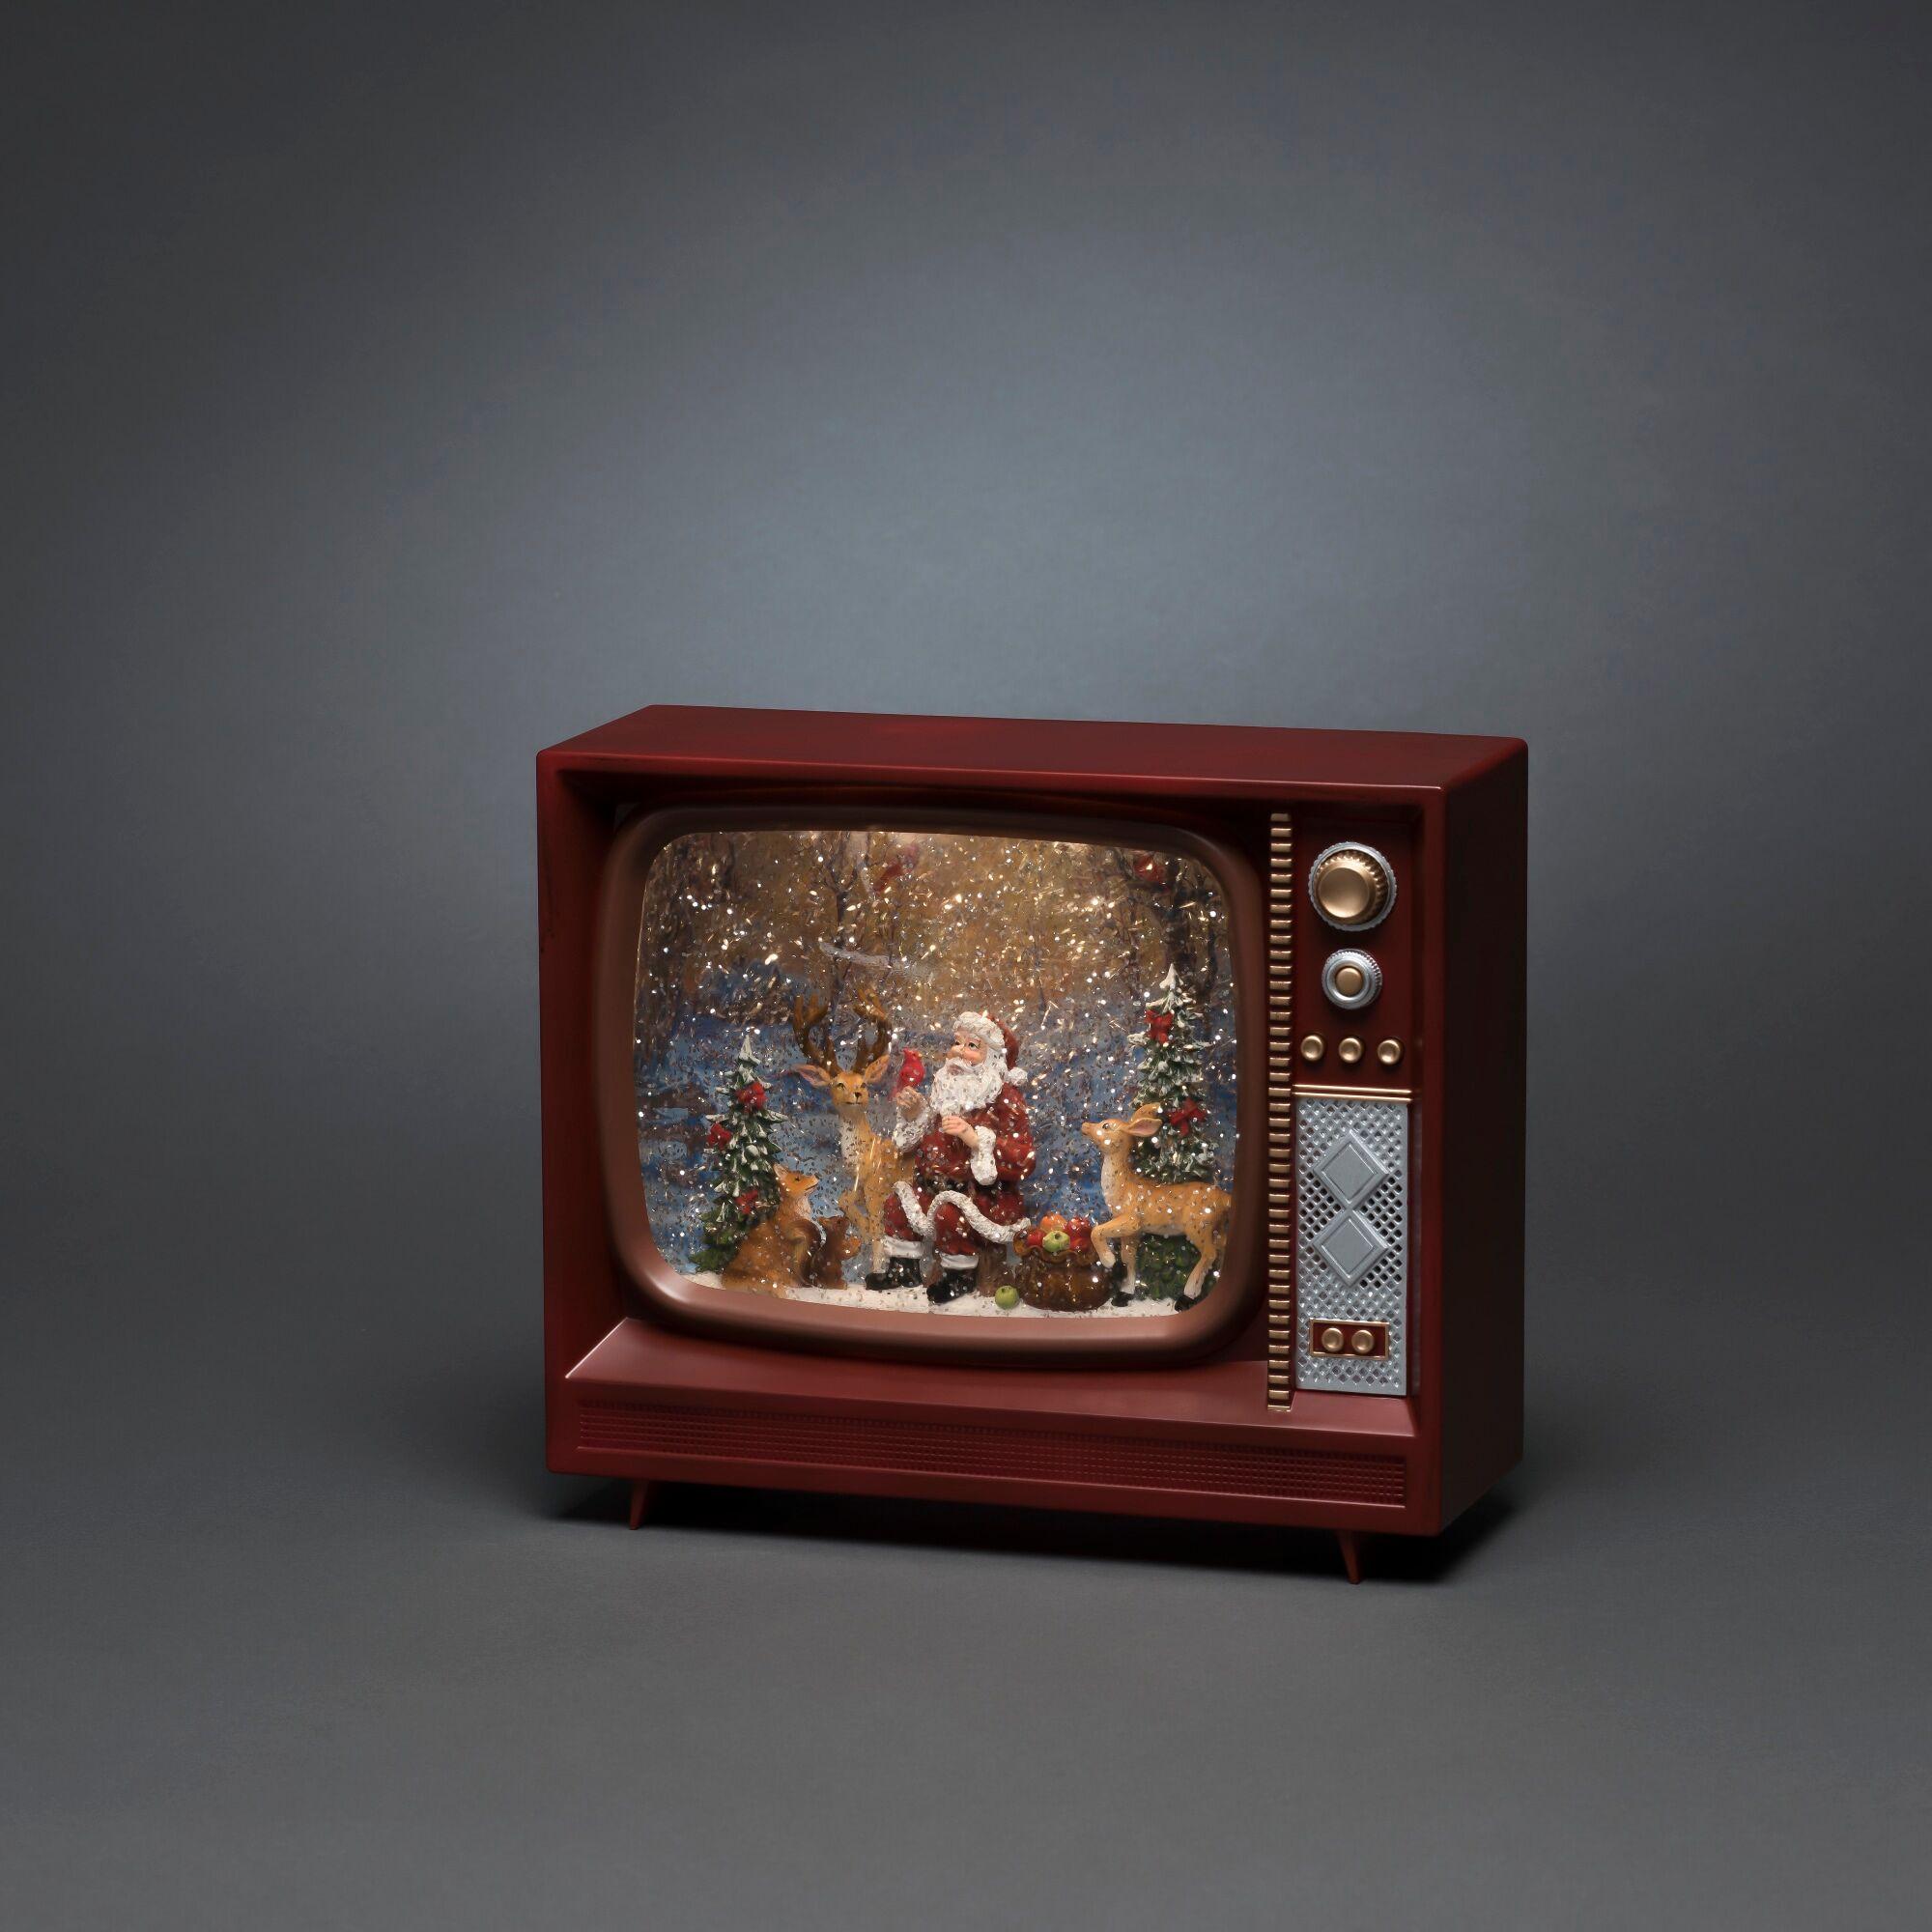 Konstsmide 4383-000 soiva TV pöytäkoriste